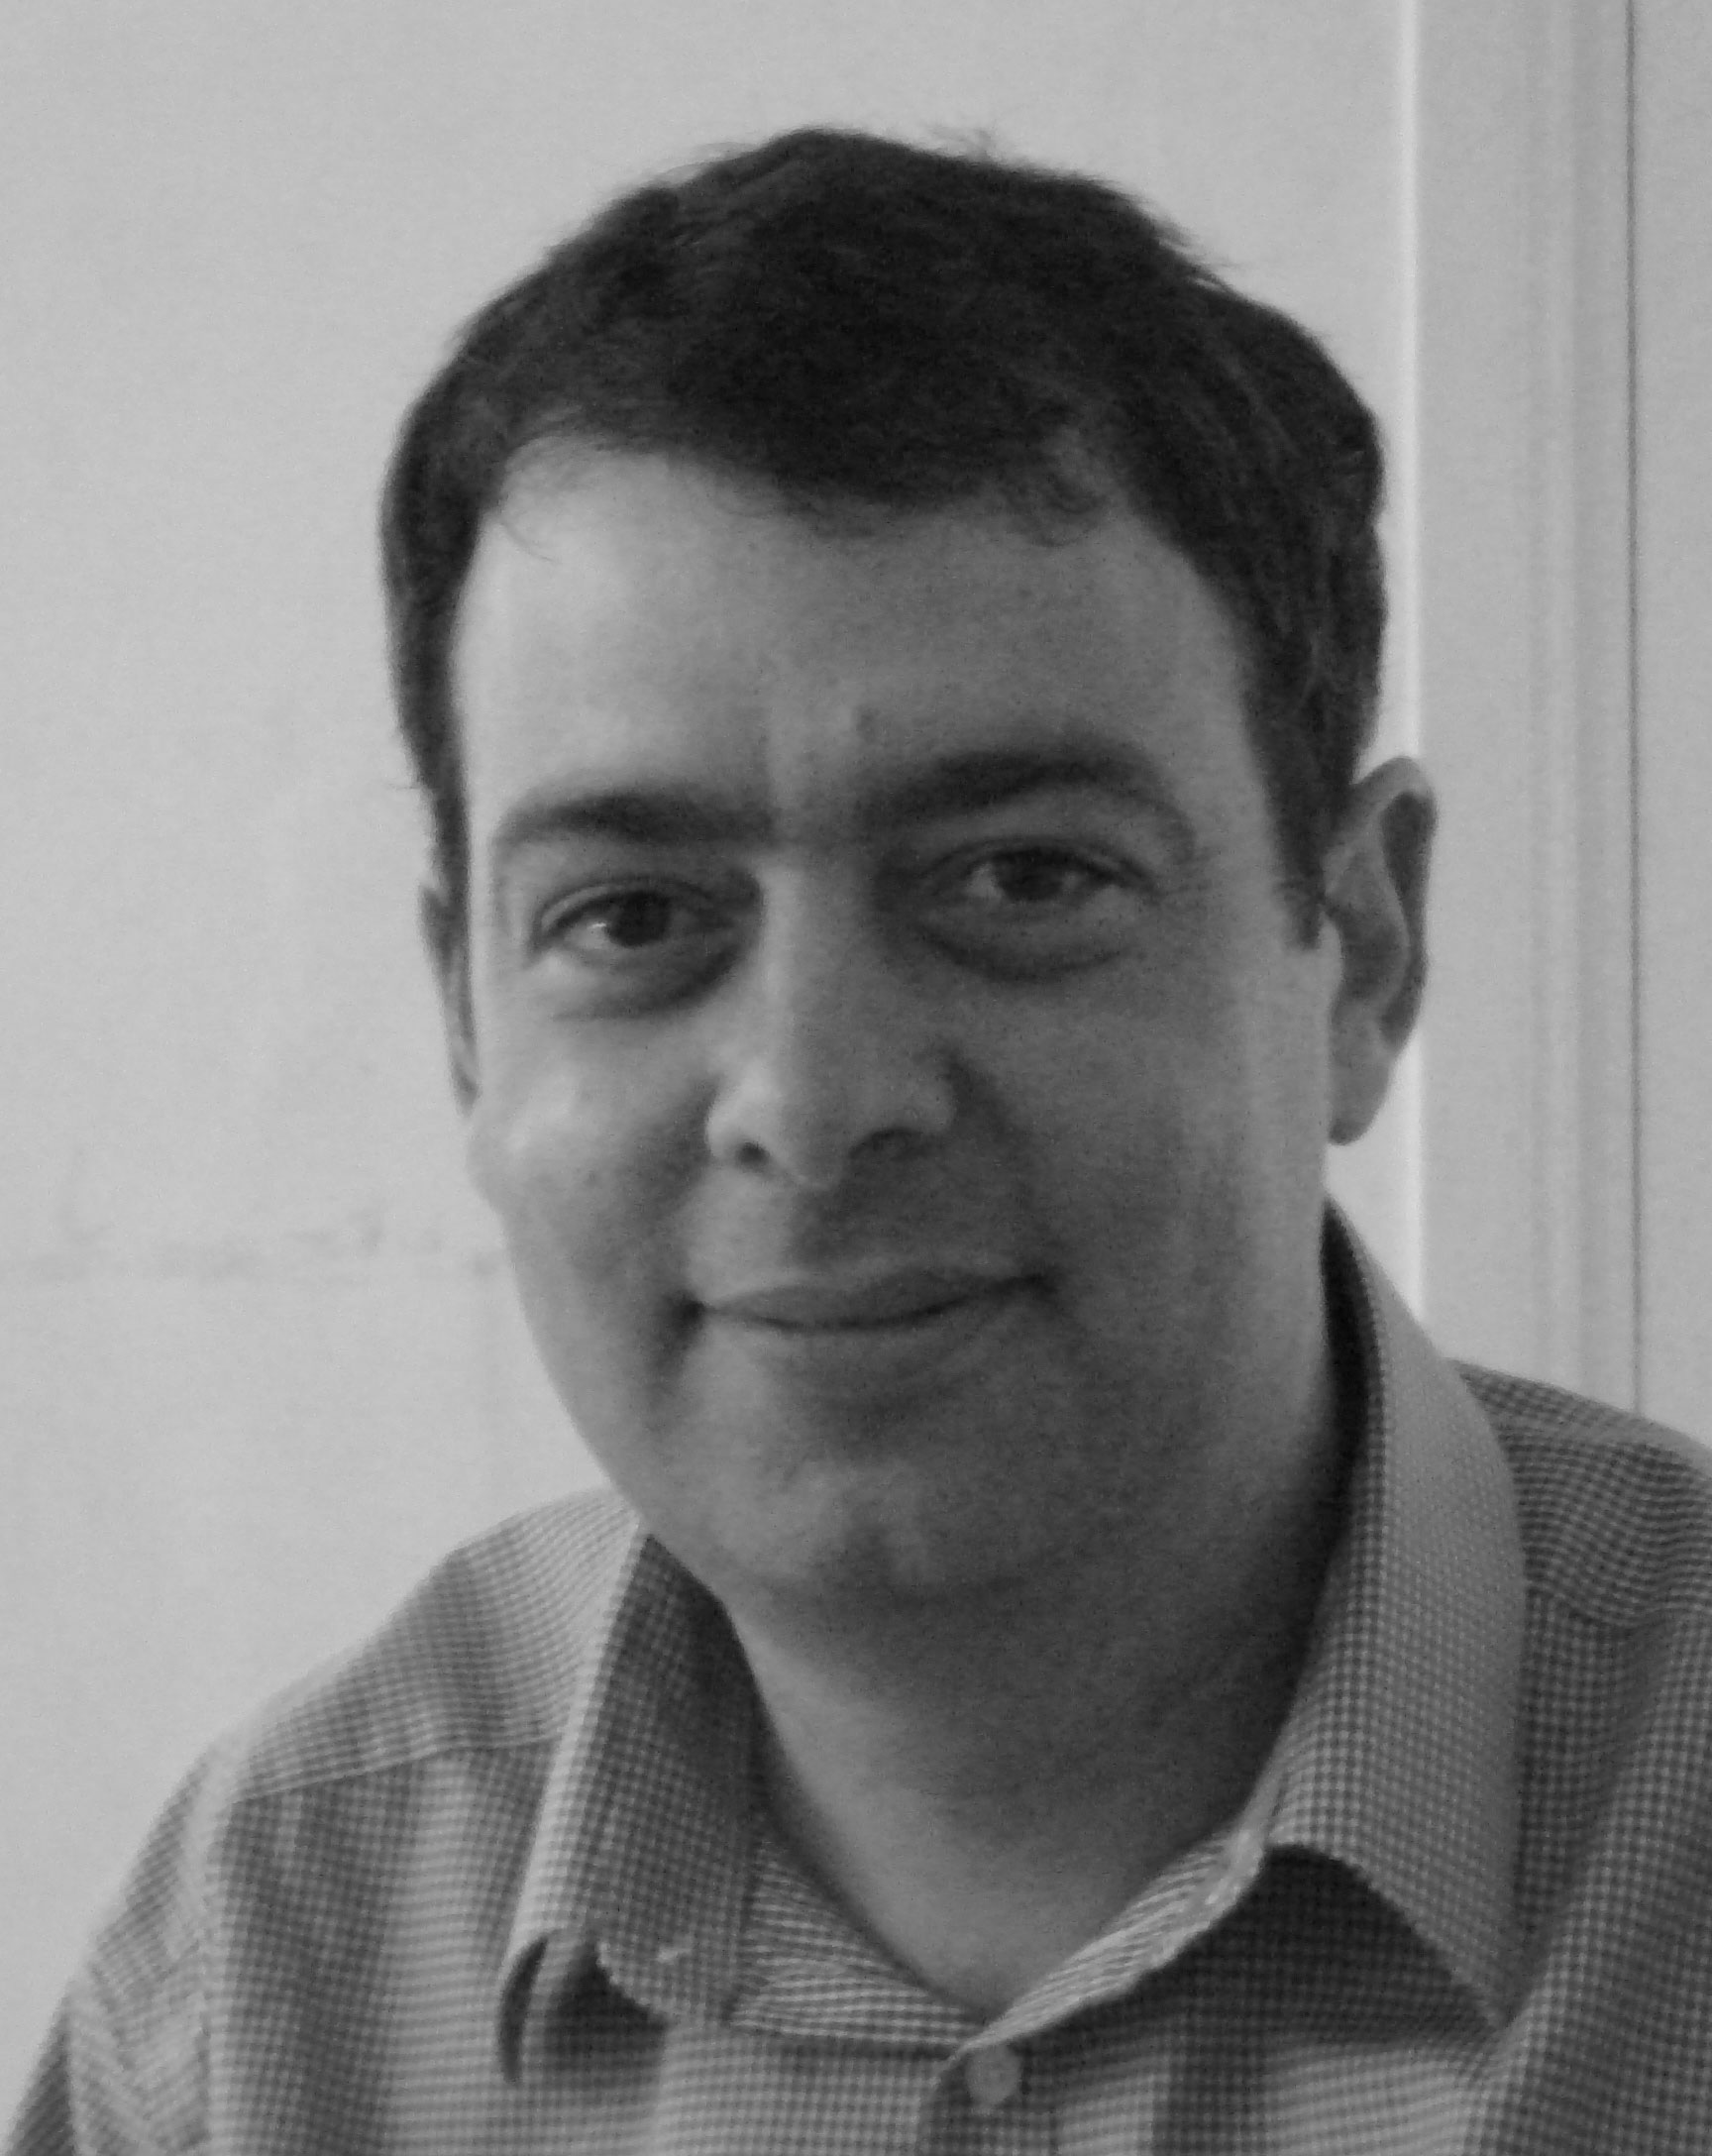 David Runciman